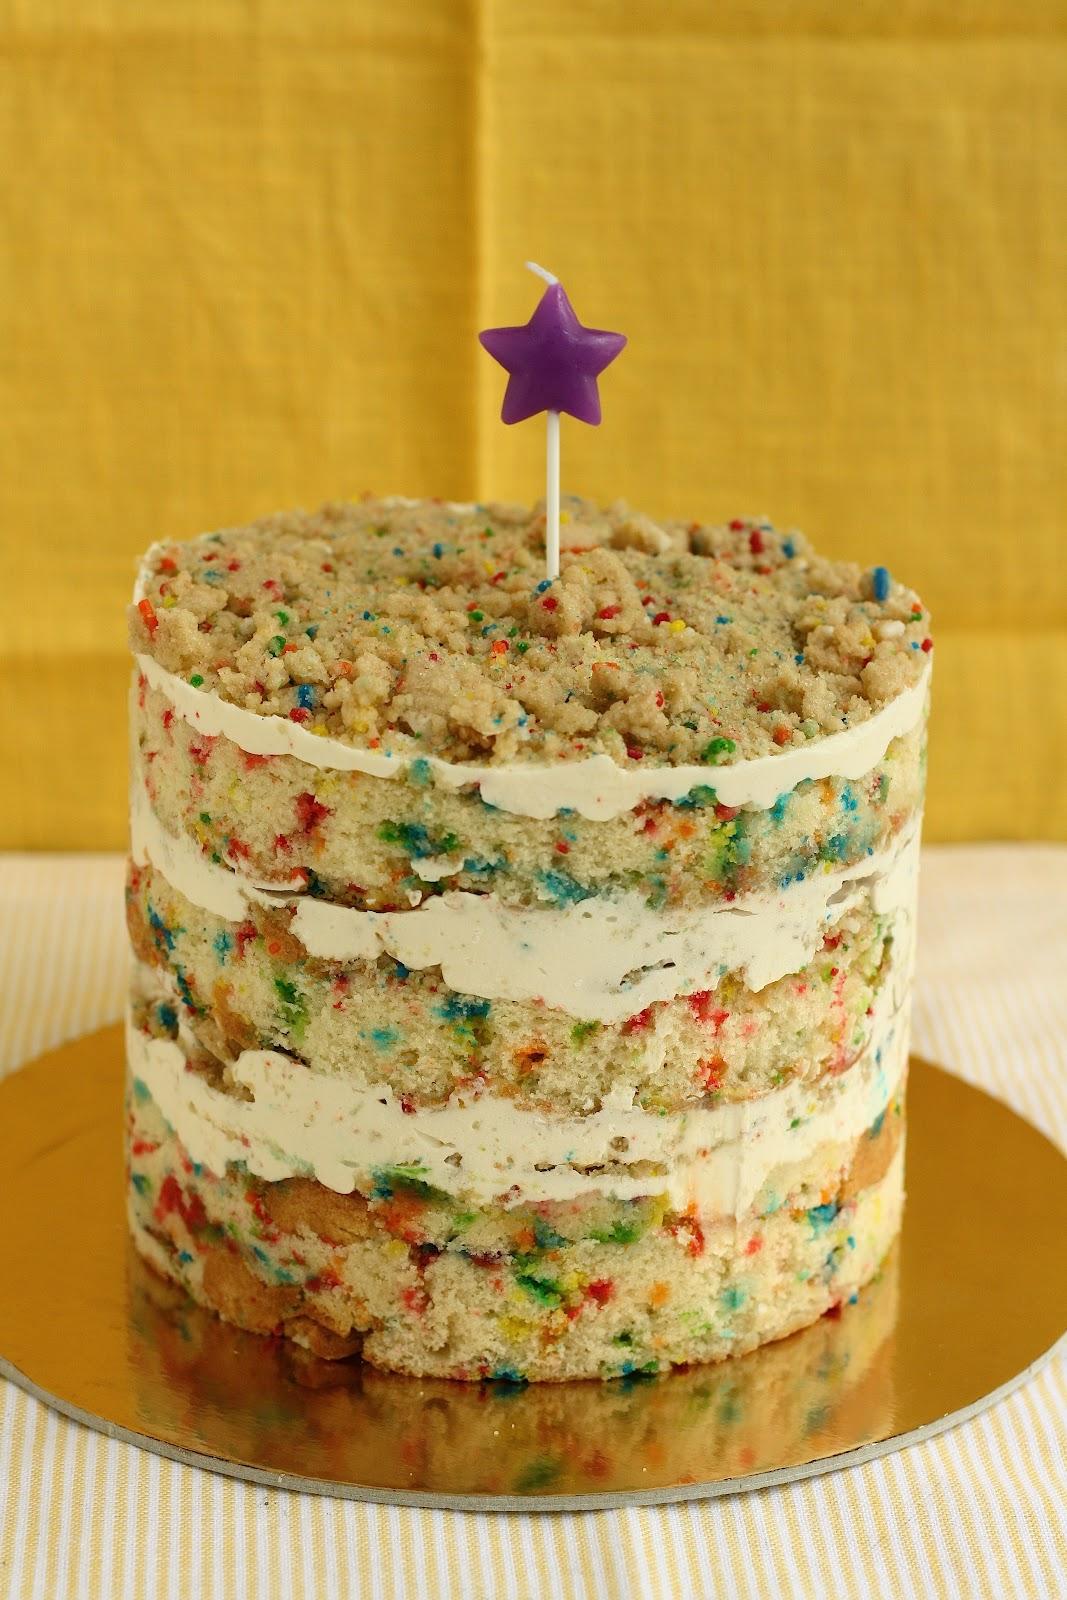 Making A Hummingbird Cake With A Cake Mix